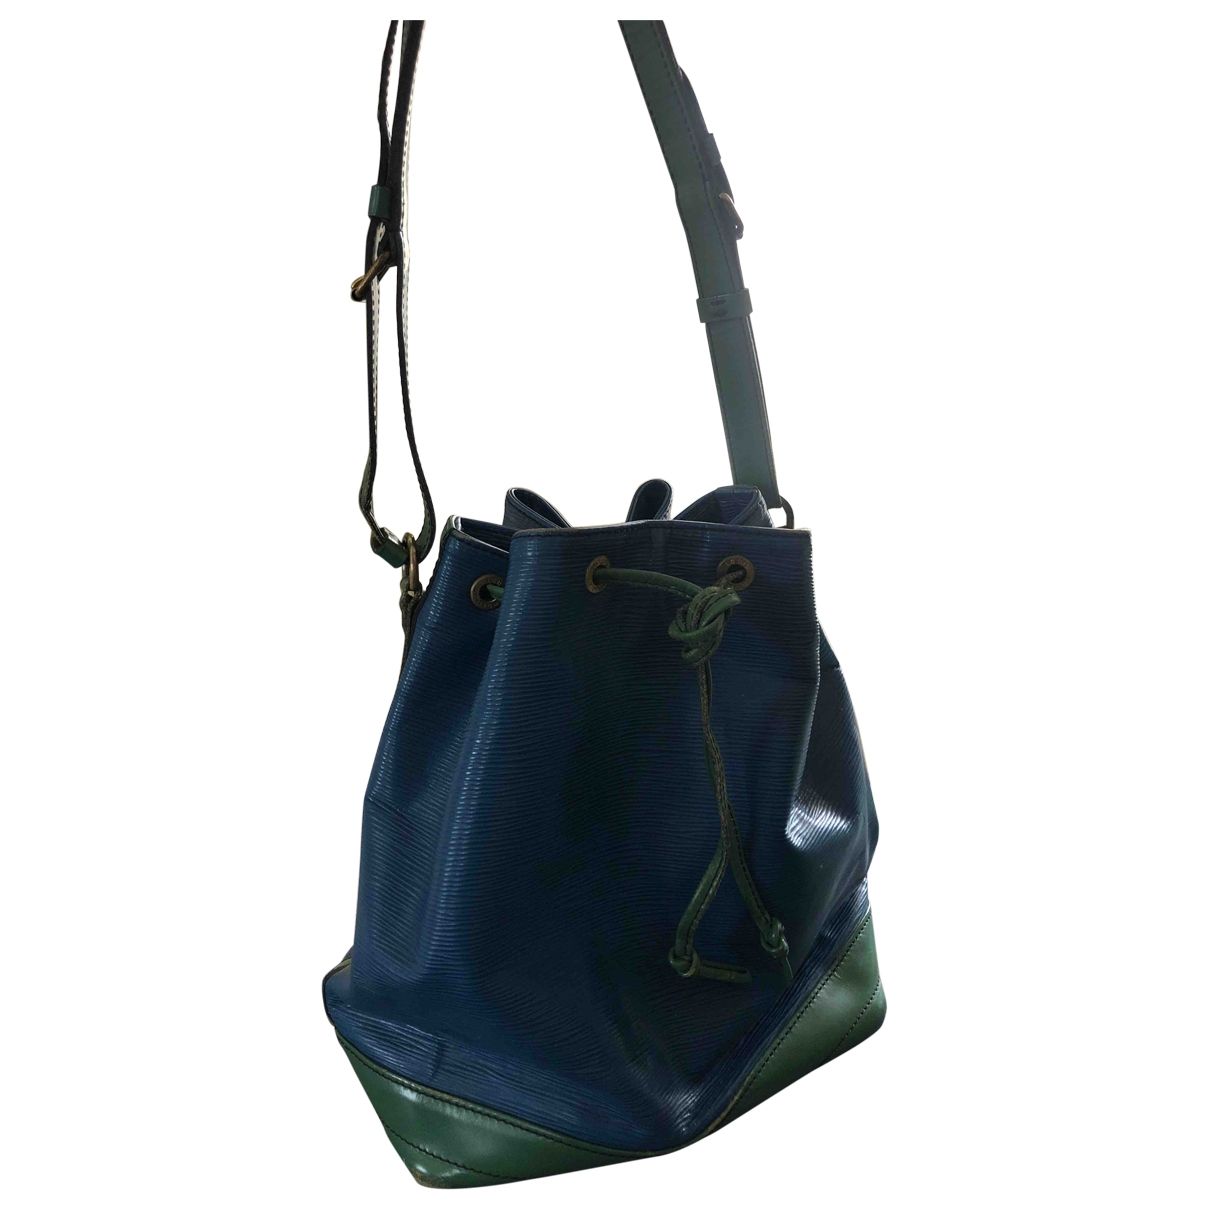 Louis Vuitton Noe Handtasche in  Blau Leder